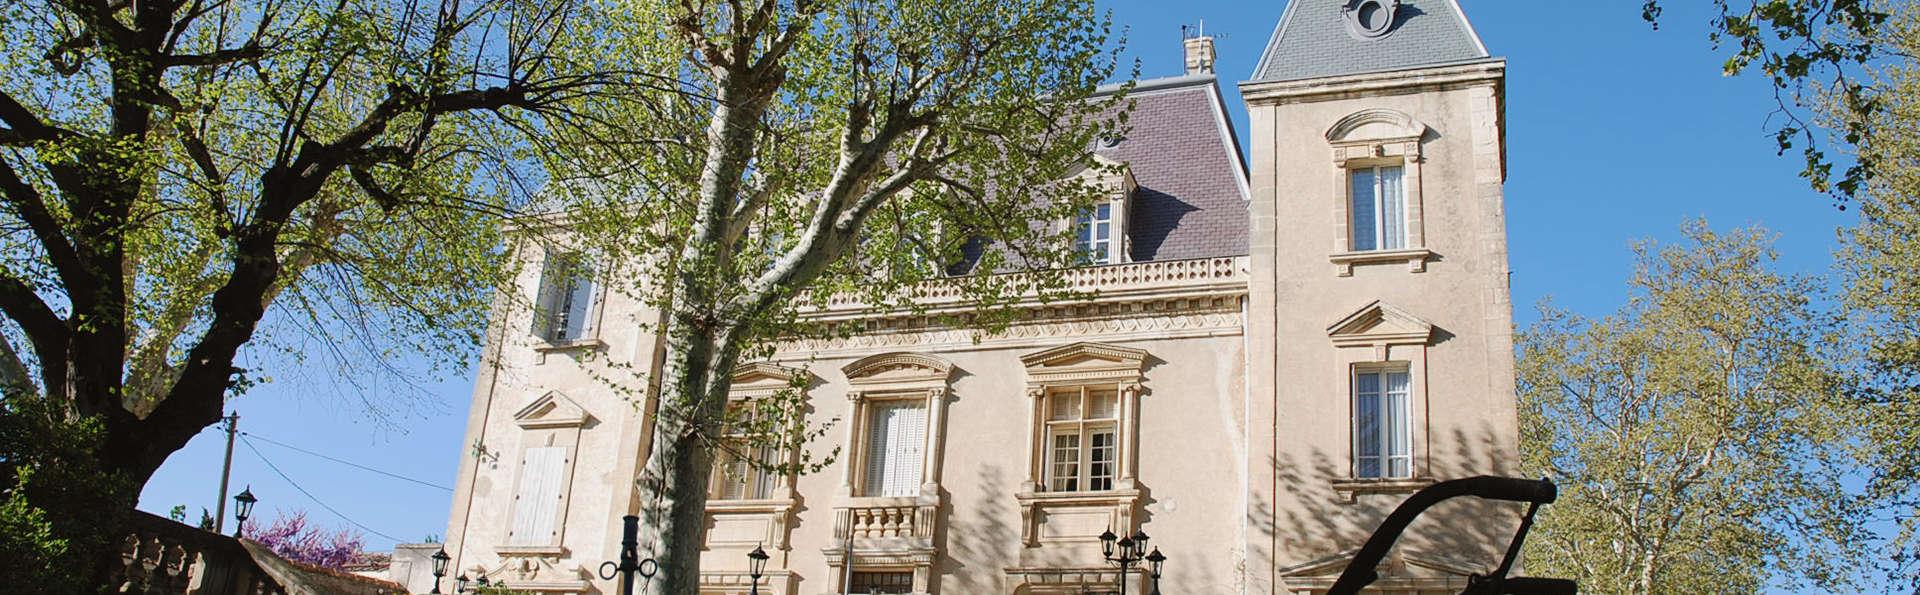 Château du Martinet - EDIT_Facada_1.jpg